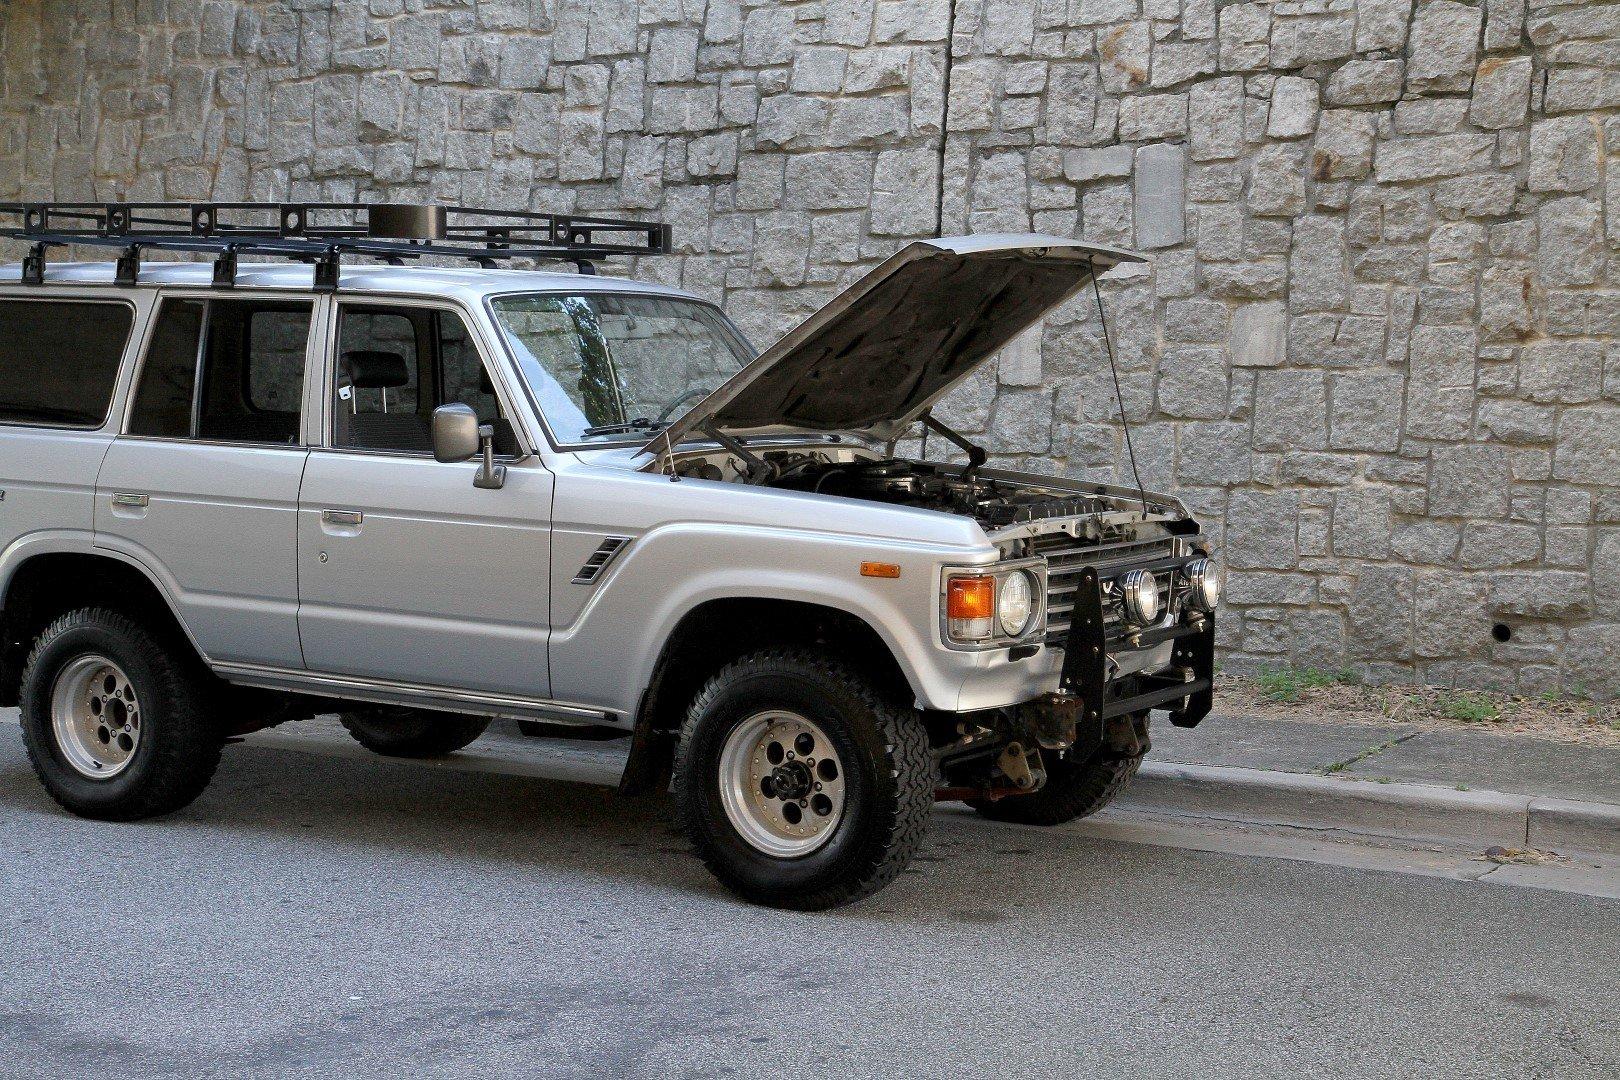 1986 Toyota Land Cruiser FJ60 for sale #100215 | MCG